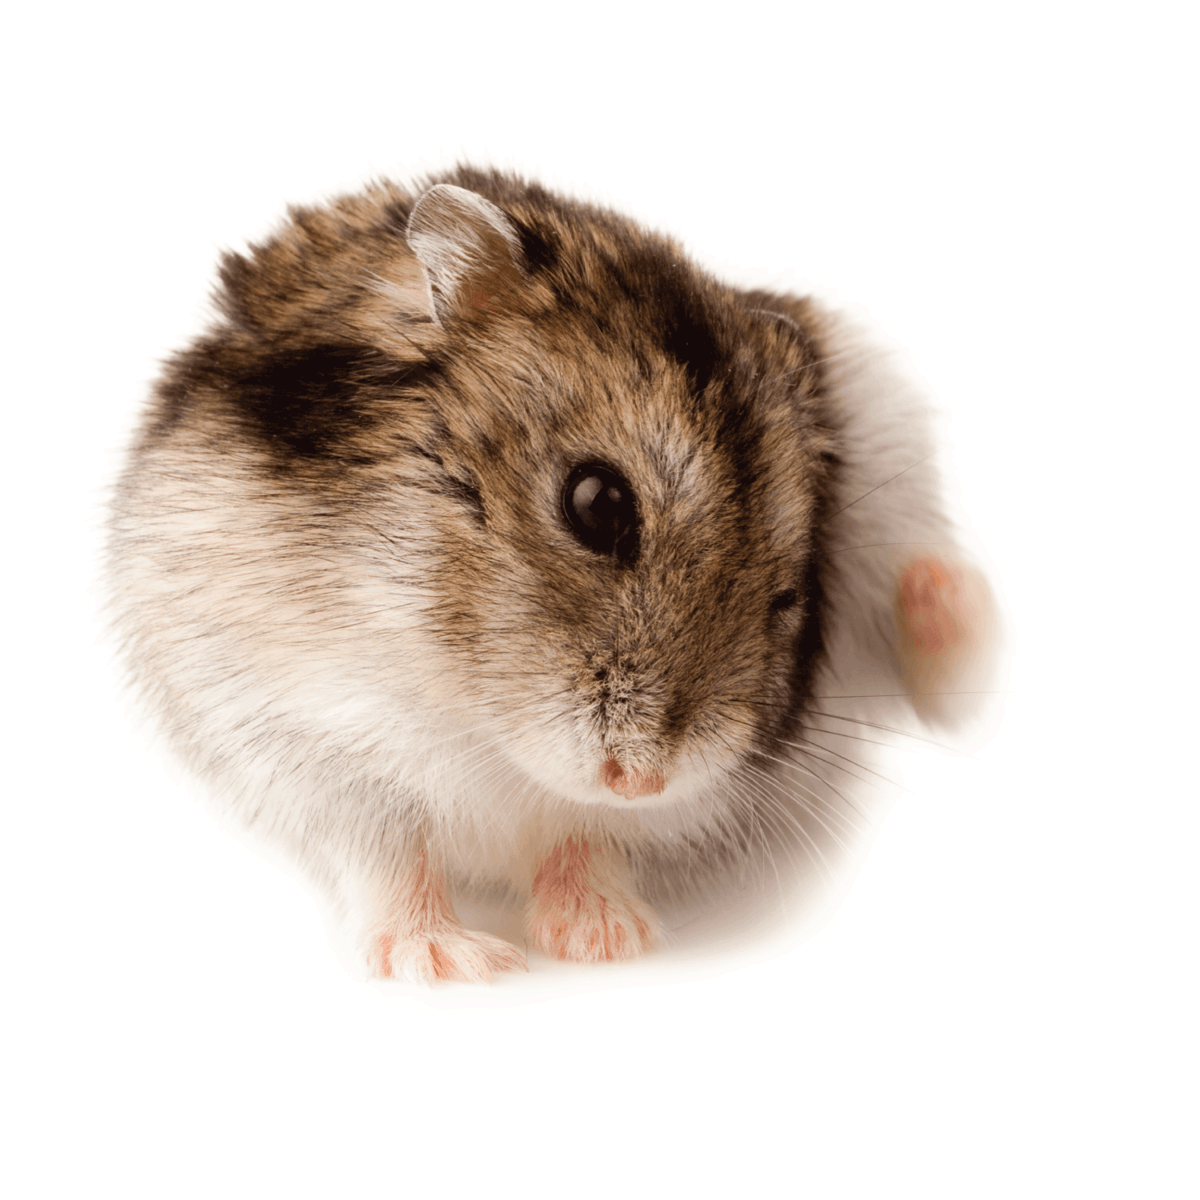 Hamster's Coat Looks Ruffled - What To Do